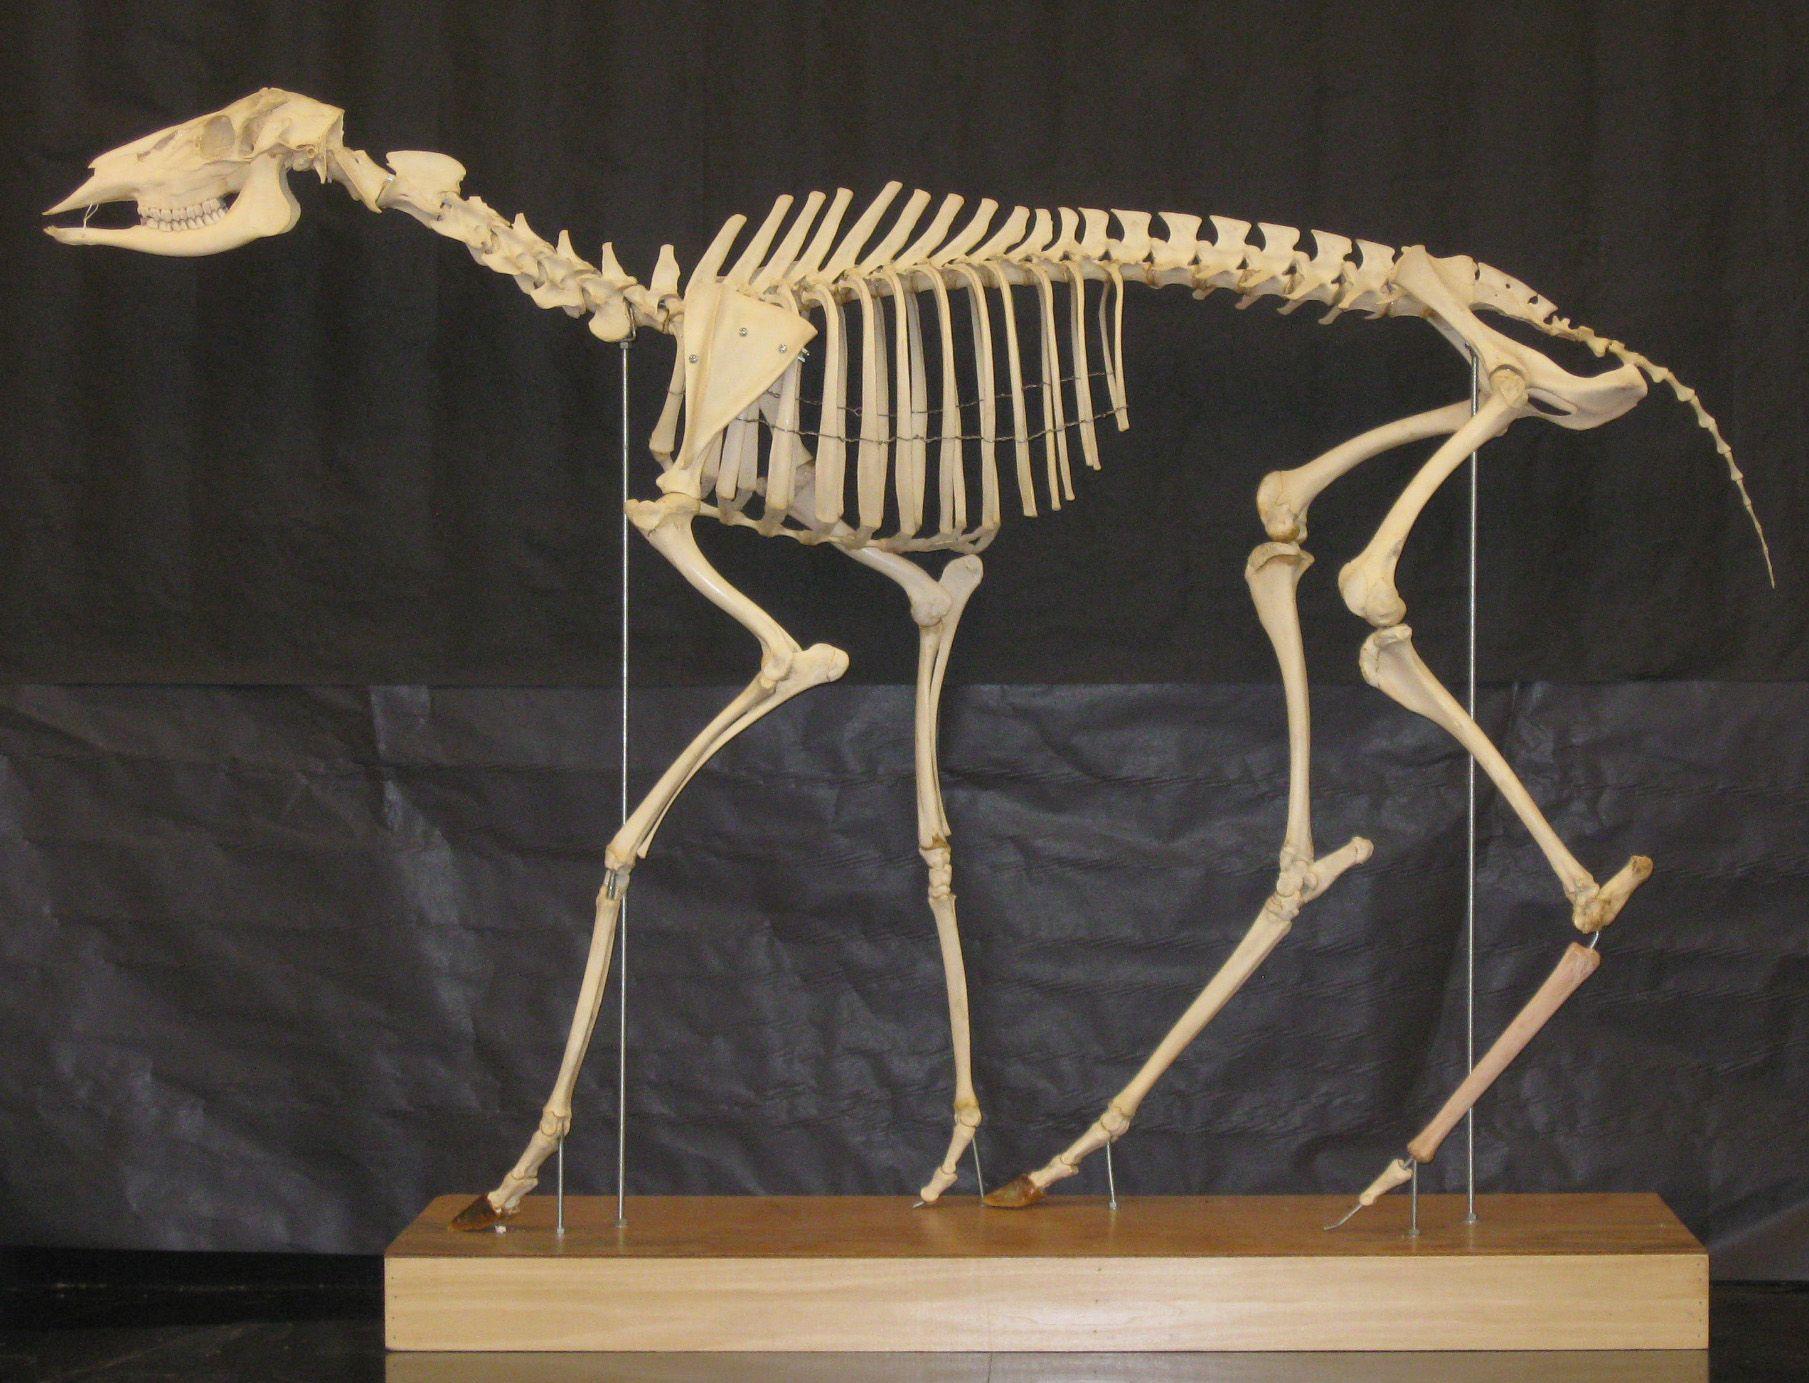 diagram of whitetail deer skull 99 tahoe radio wiring a tutorial masterpost animals etc pinterest